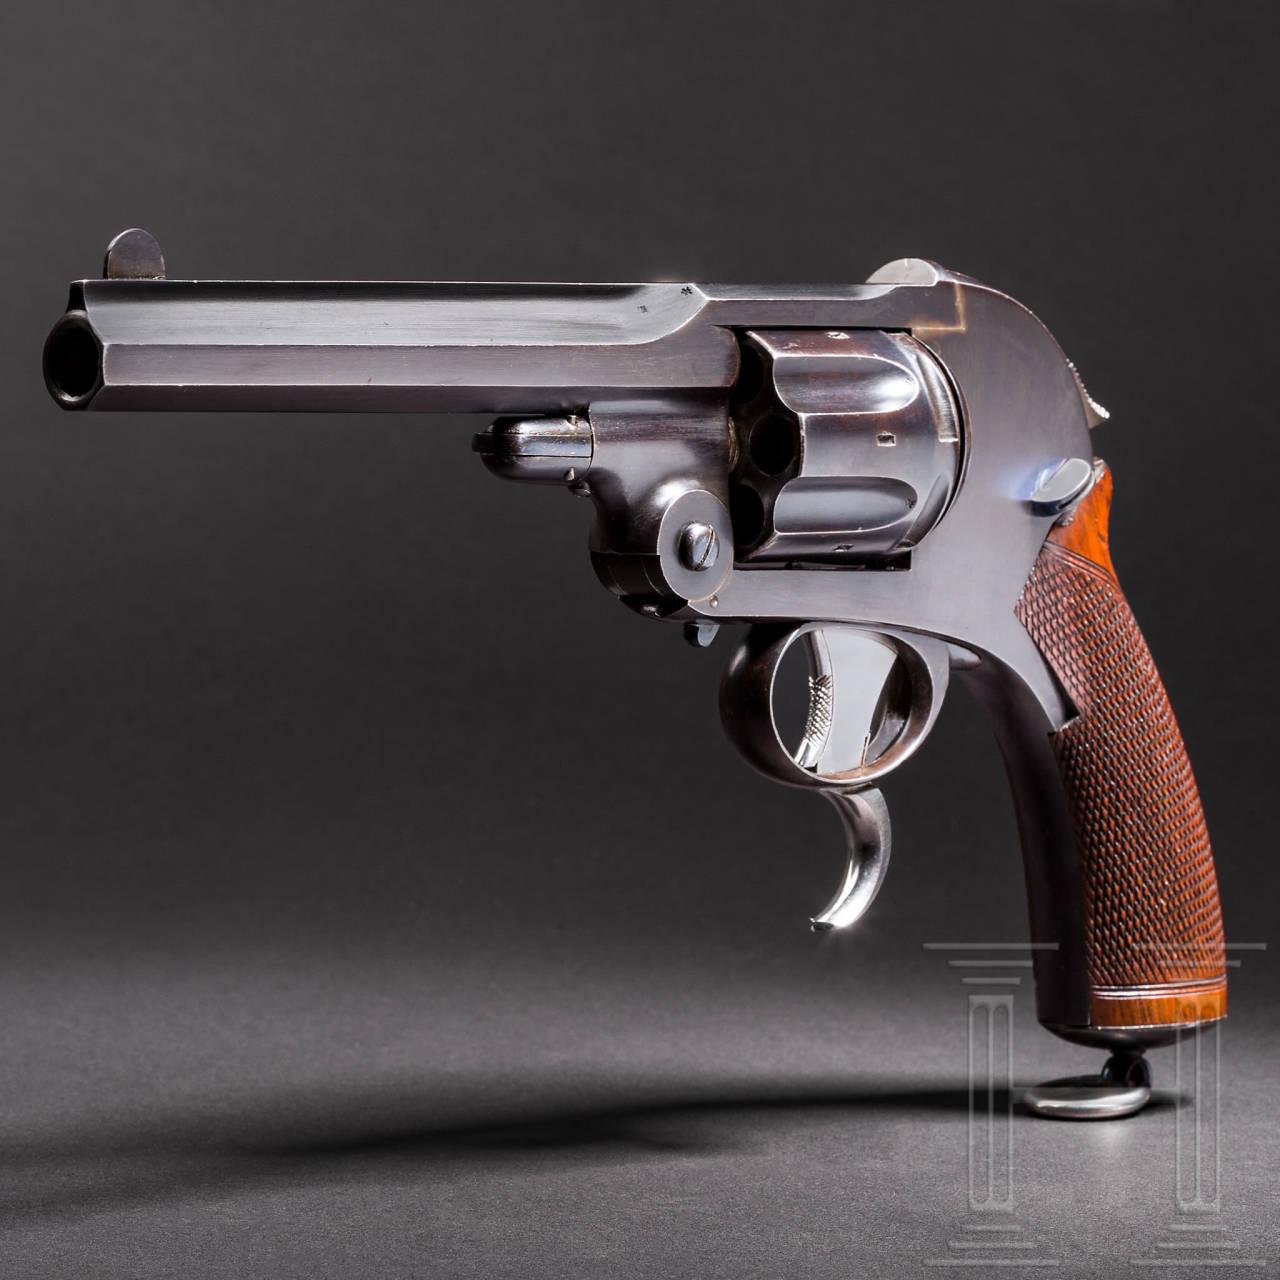 Revolver Konstruktion Schlund, Kynoch Gun Factory Aston, Prototyp 1885